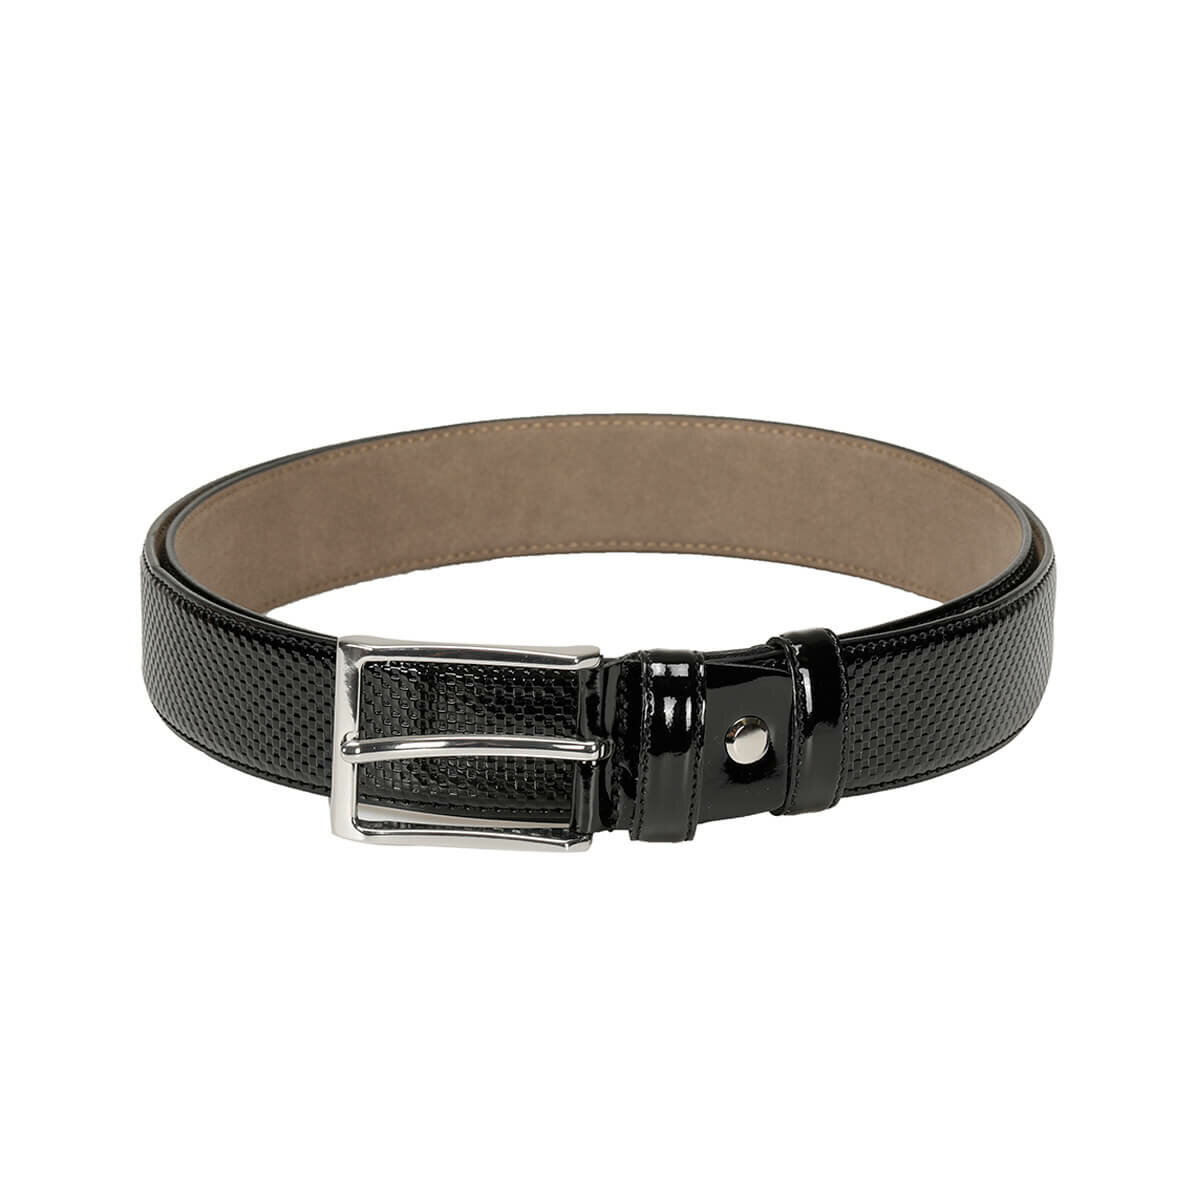 FLO MKNYL3409 Black Male Belt Garamond